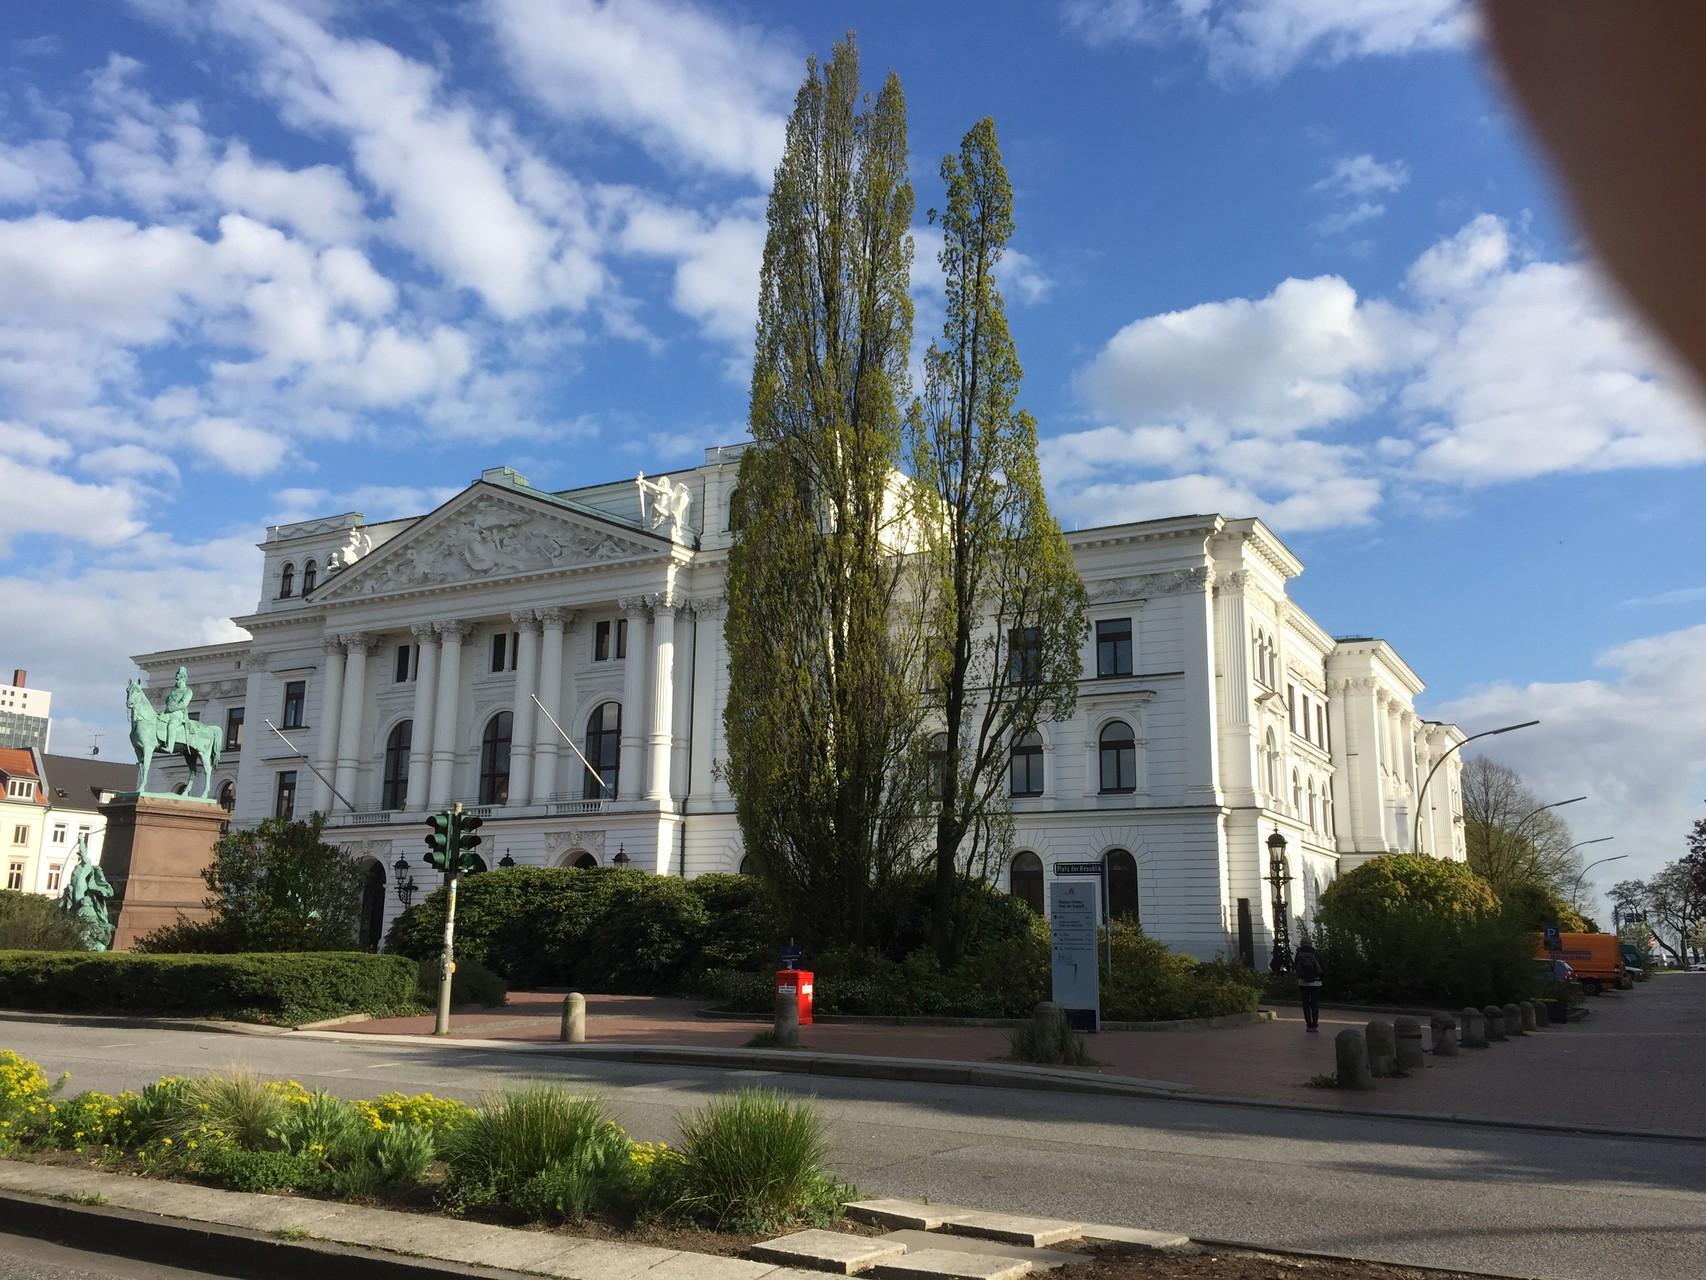 Altonaer Rathaus - heute Bezirksamt